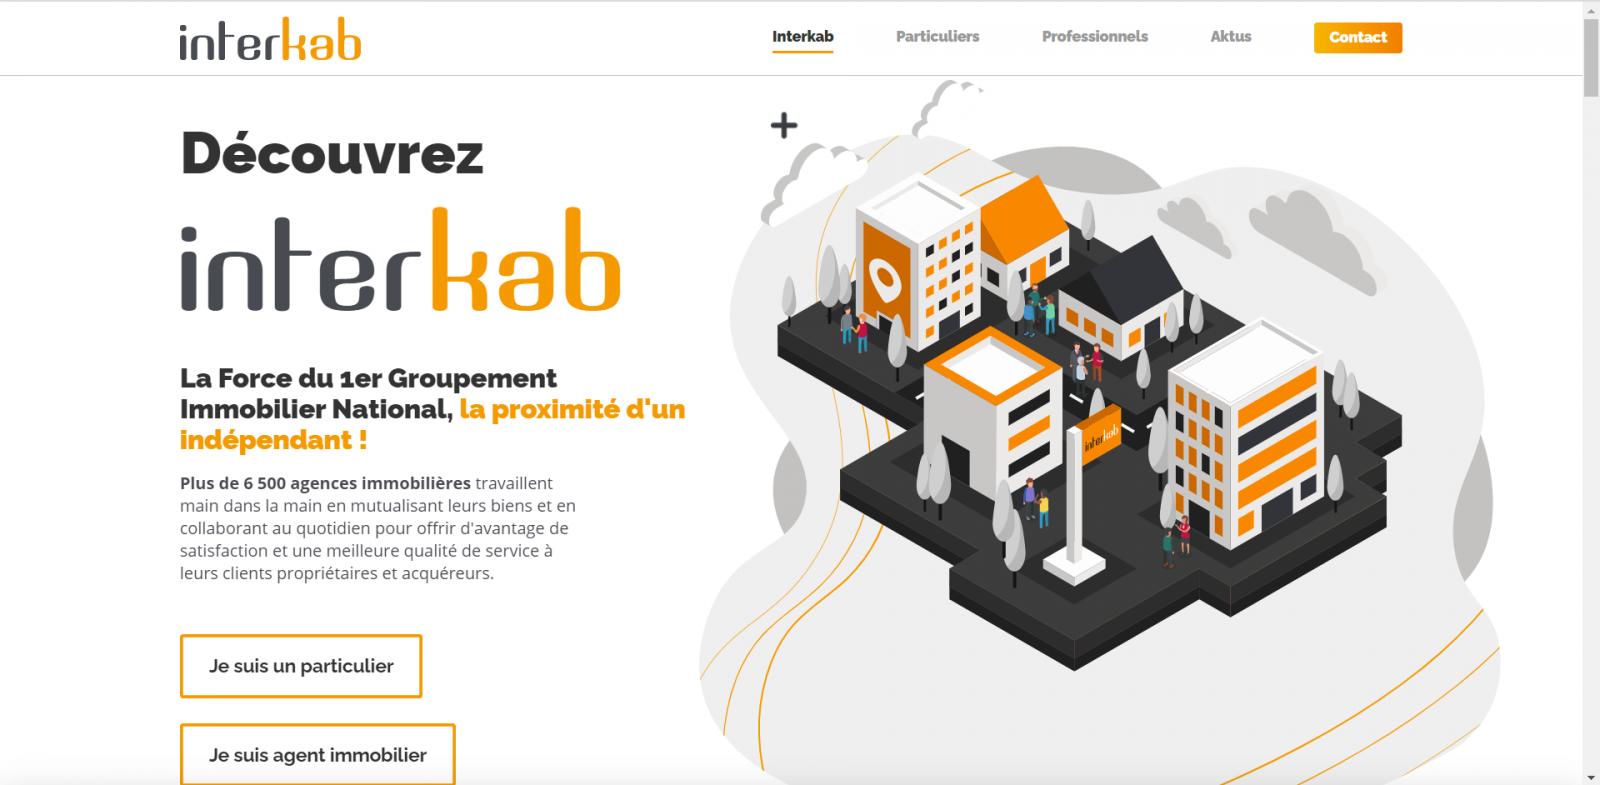 Interkab Homepage La Reserve